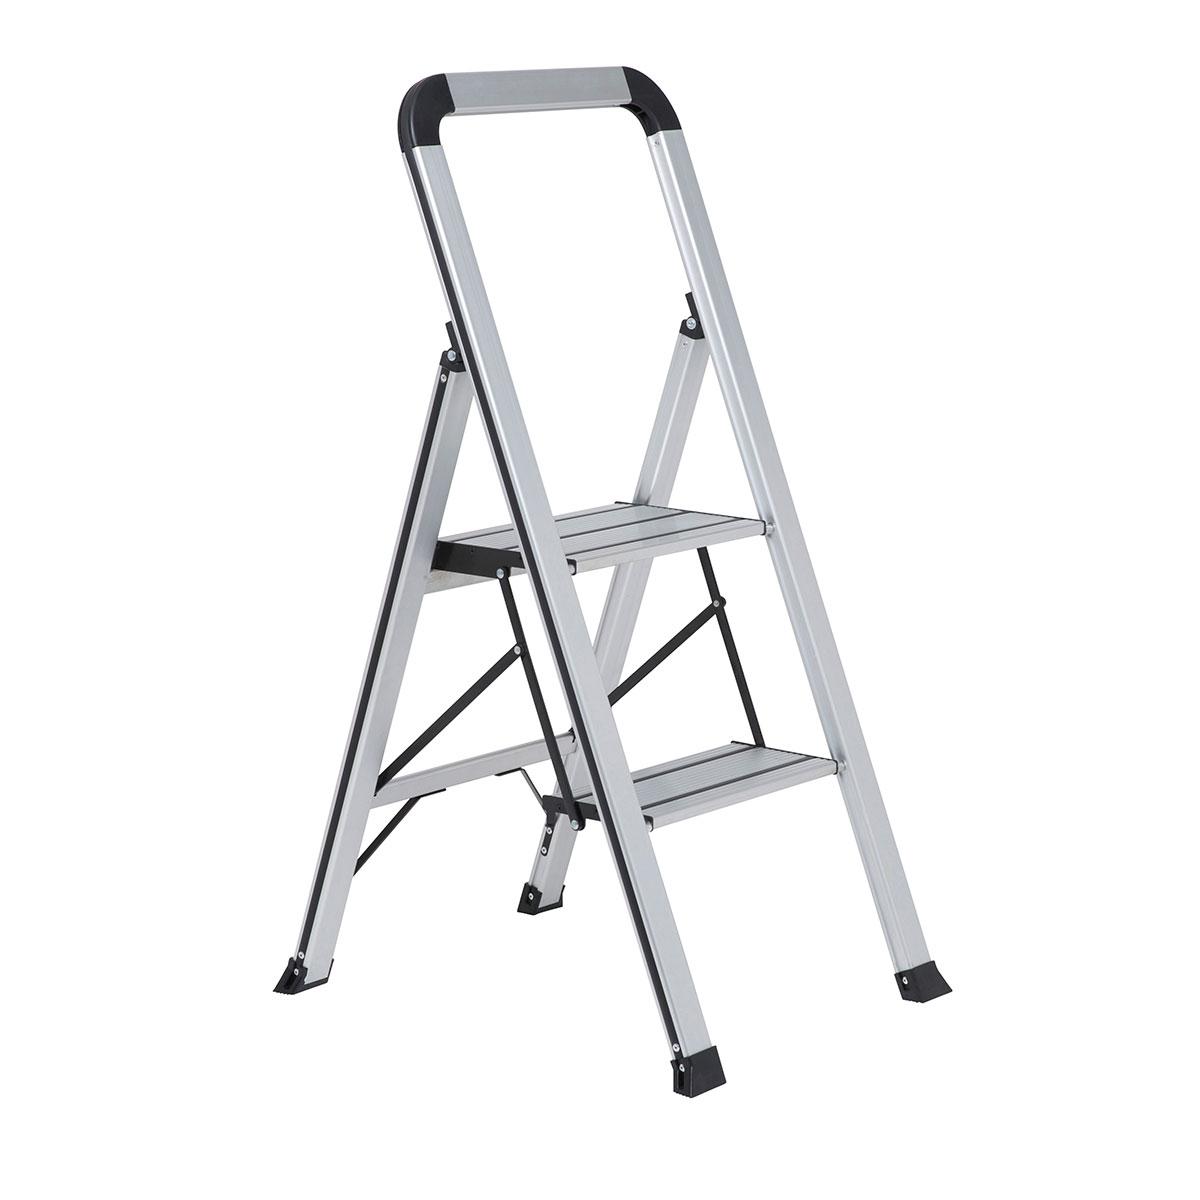 Wolf 2 Step Ladder With Aluminium Slimline Folding Frame